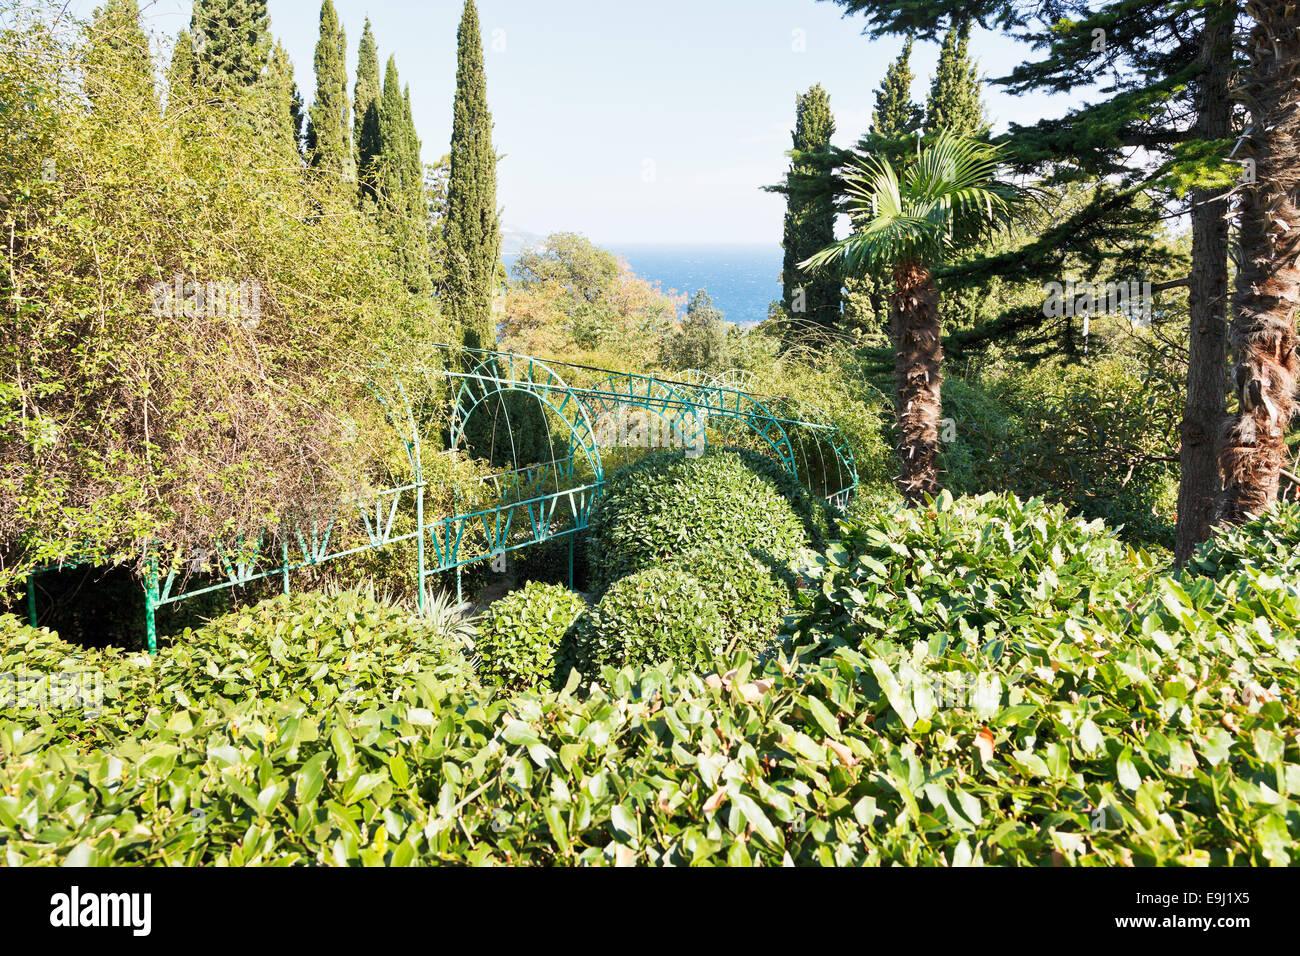 view of Livadiya garden on Southern Coast of Crimea and Black Sea - Stock Image